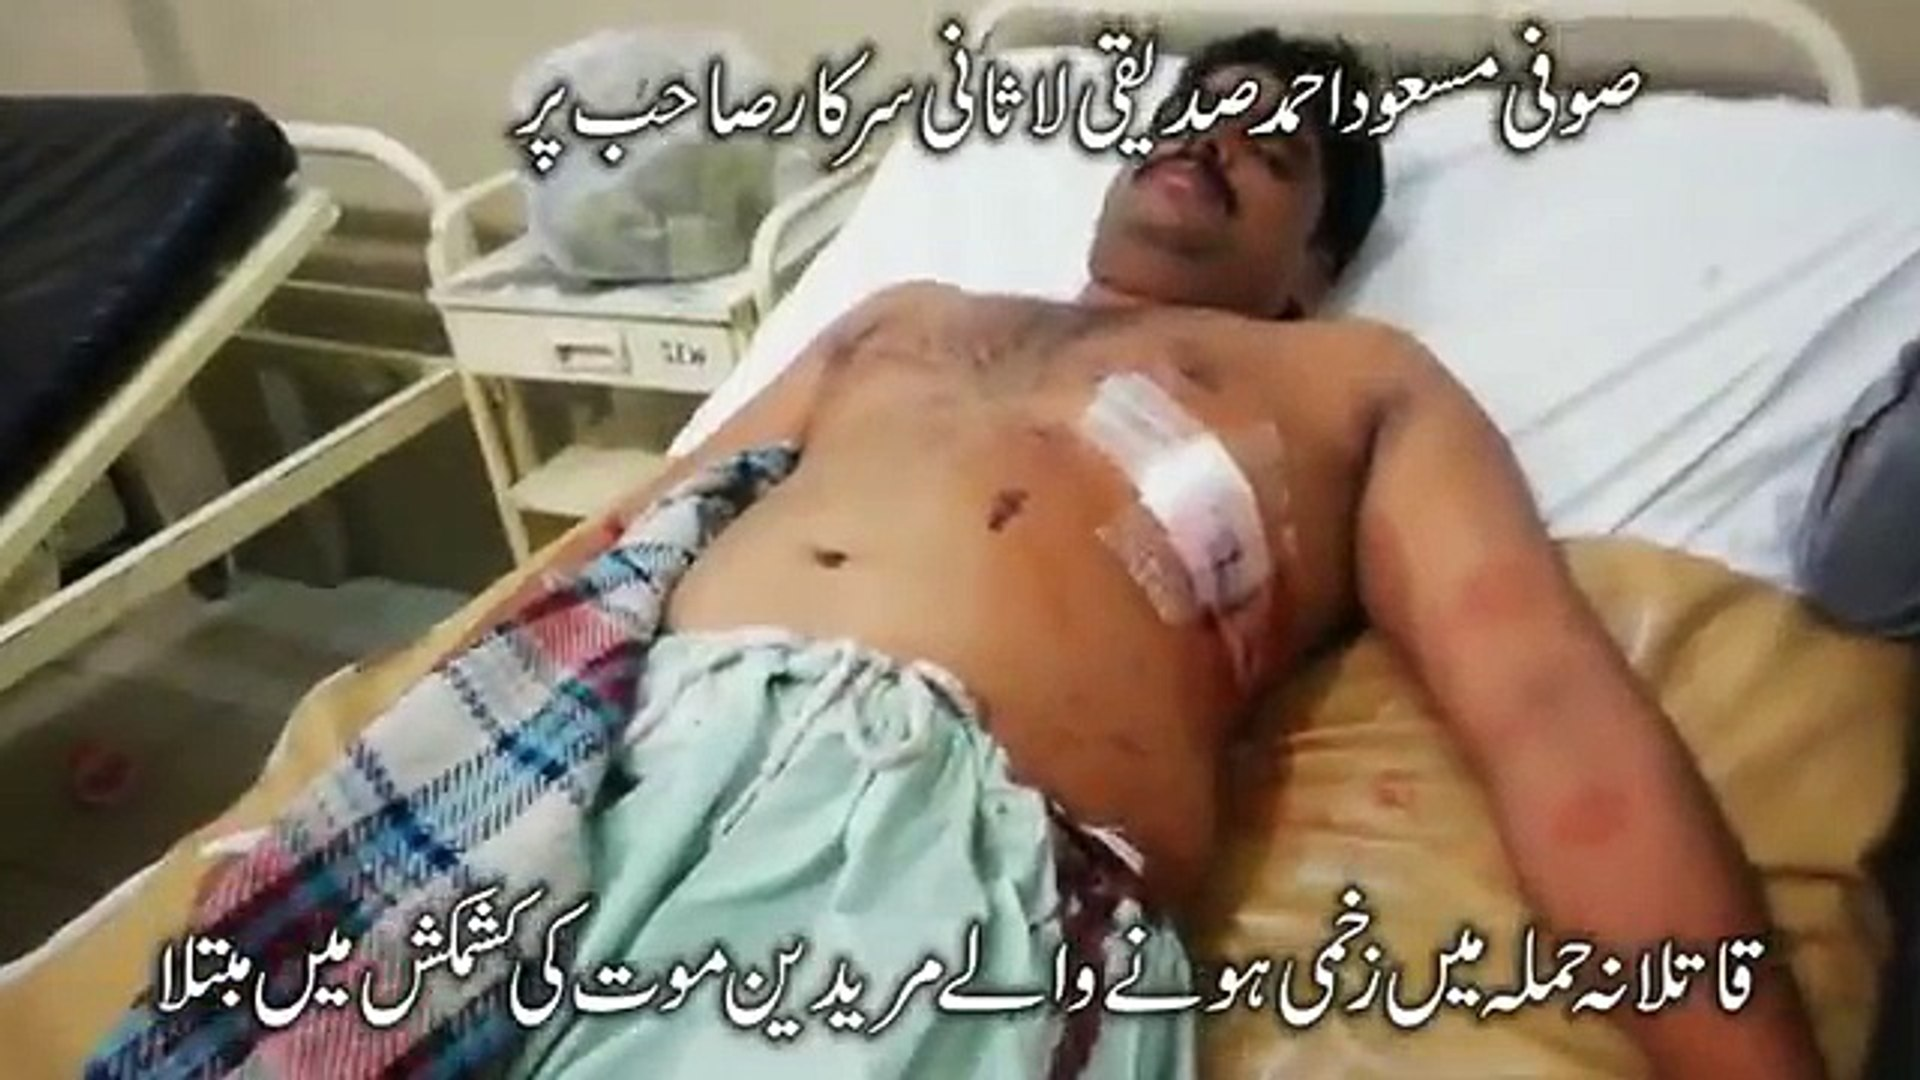 Lasani Sarkar par Qatlana Hamla - Special Coverage From Emergency WardThe renowned and famous spirit